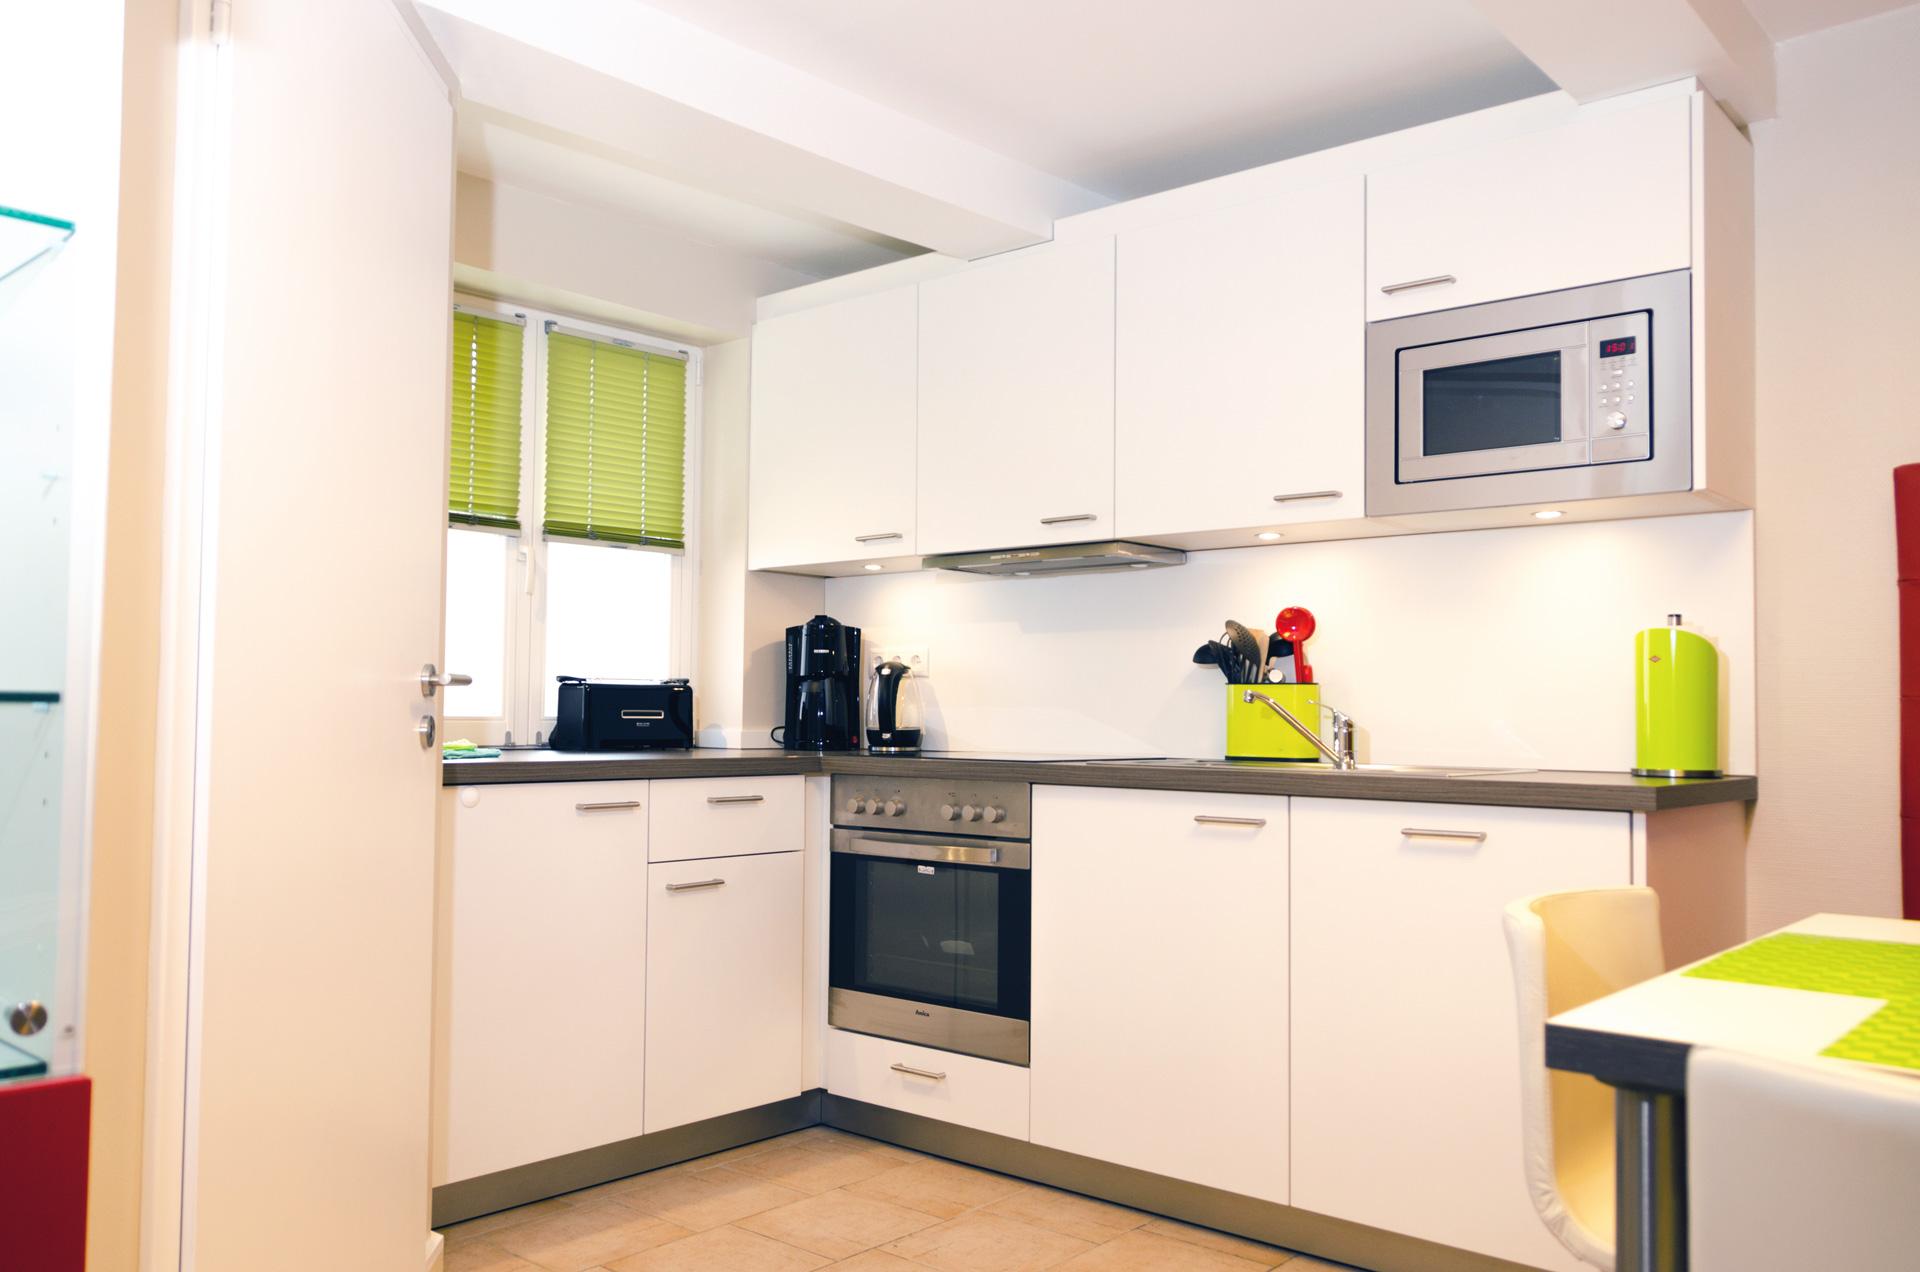 kueche ferienhaus warendorf. Black Bedroom Furniture Sets. Home Design Ideas